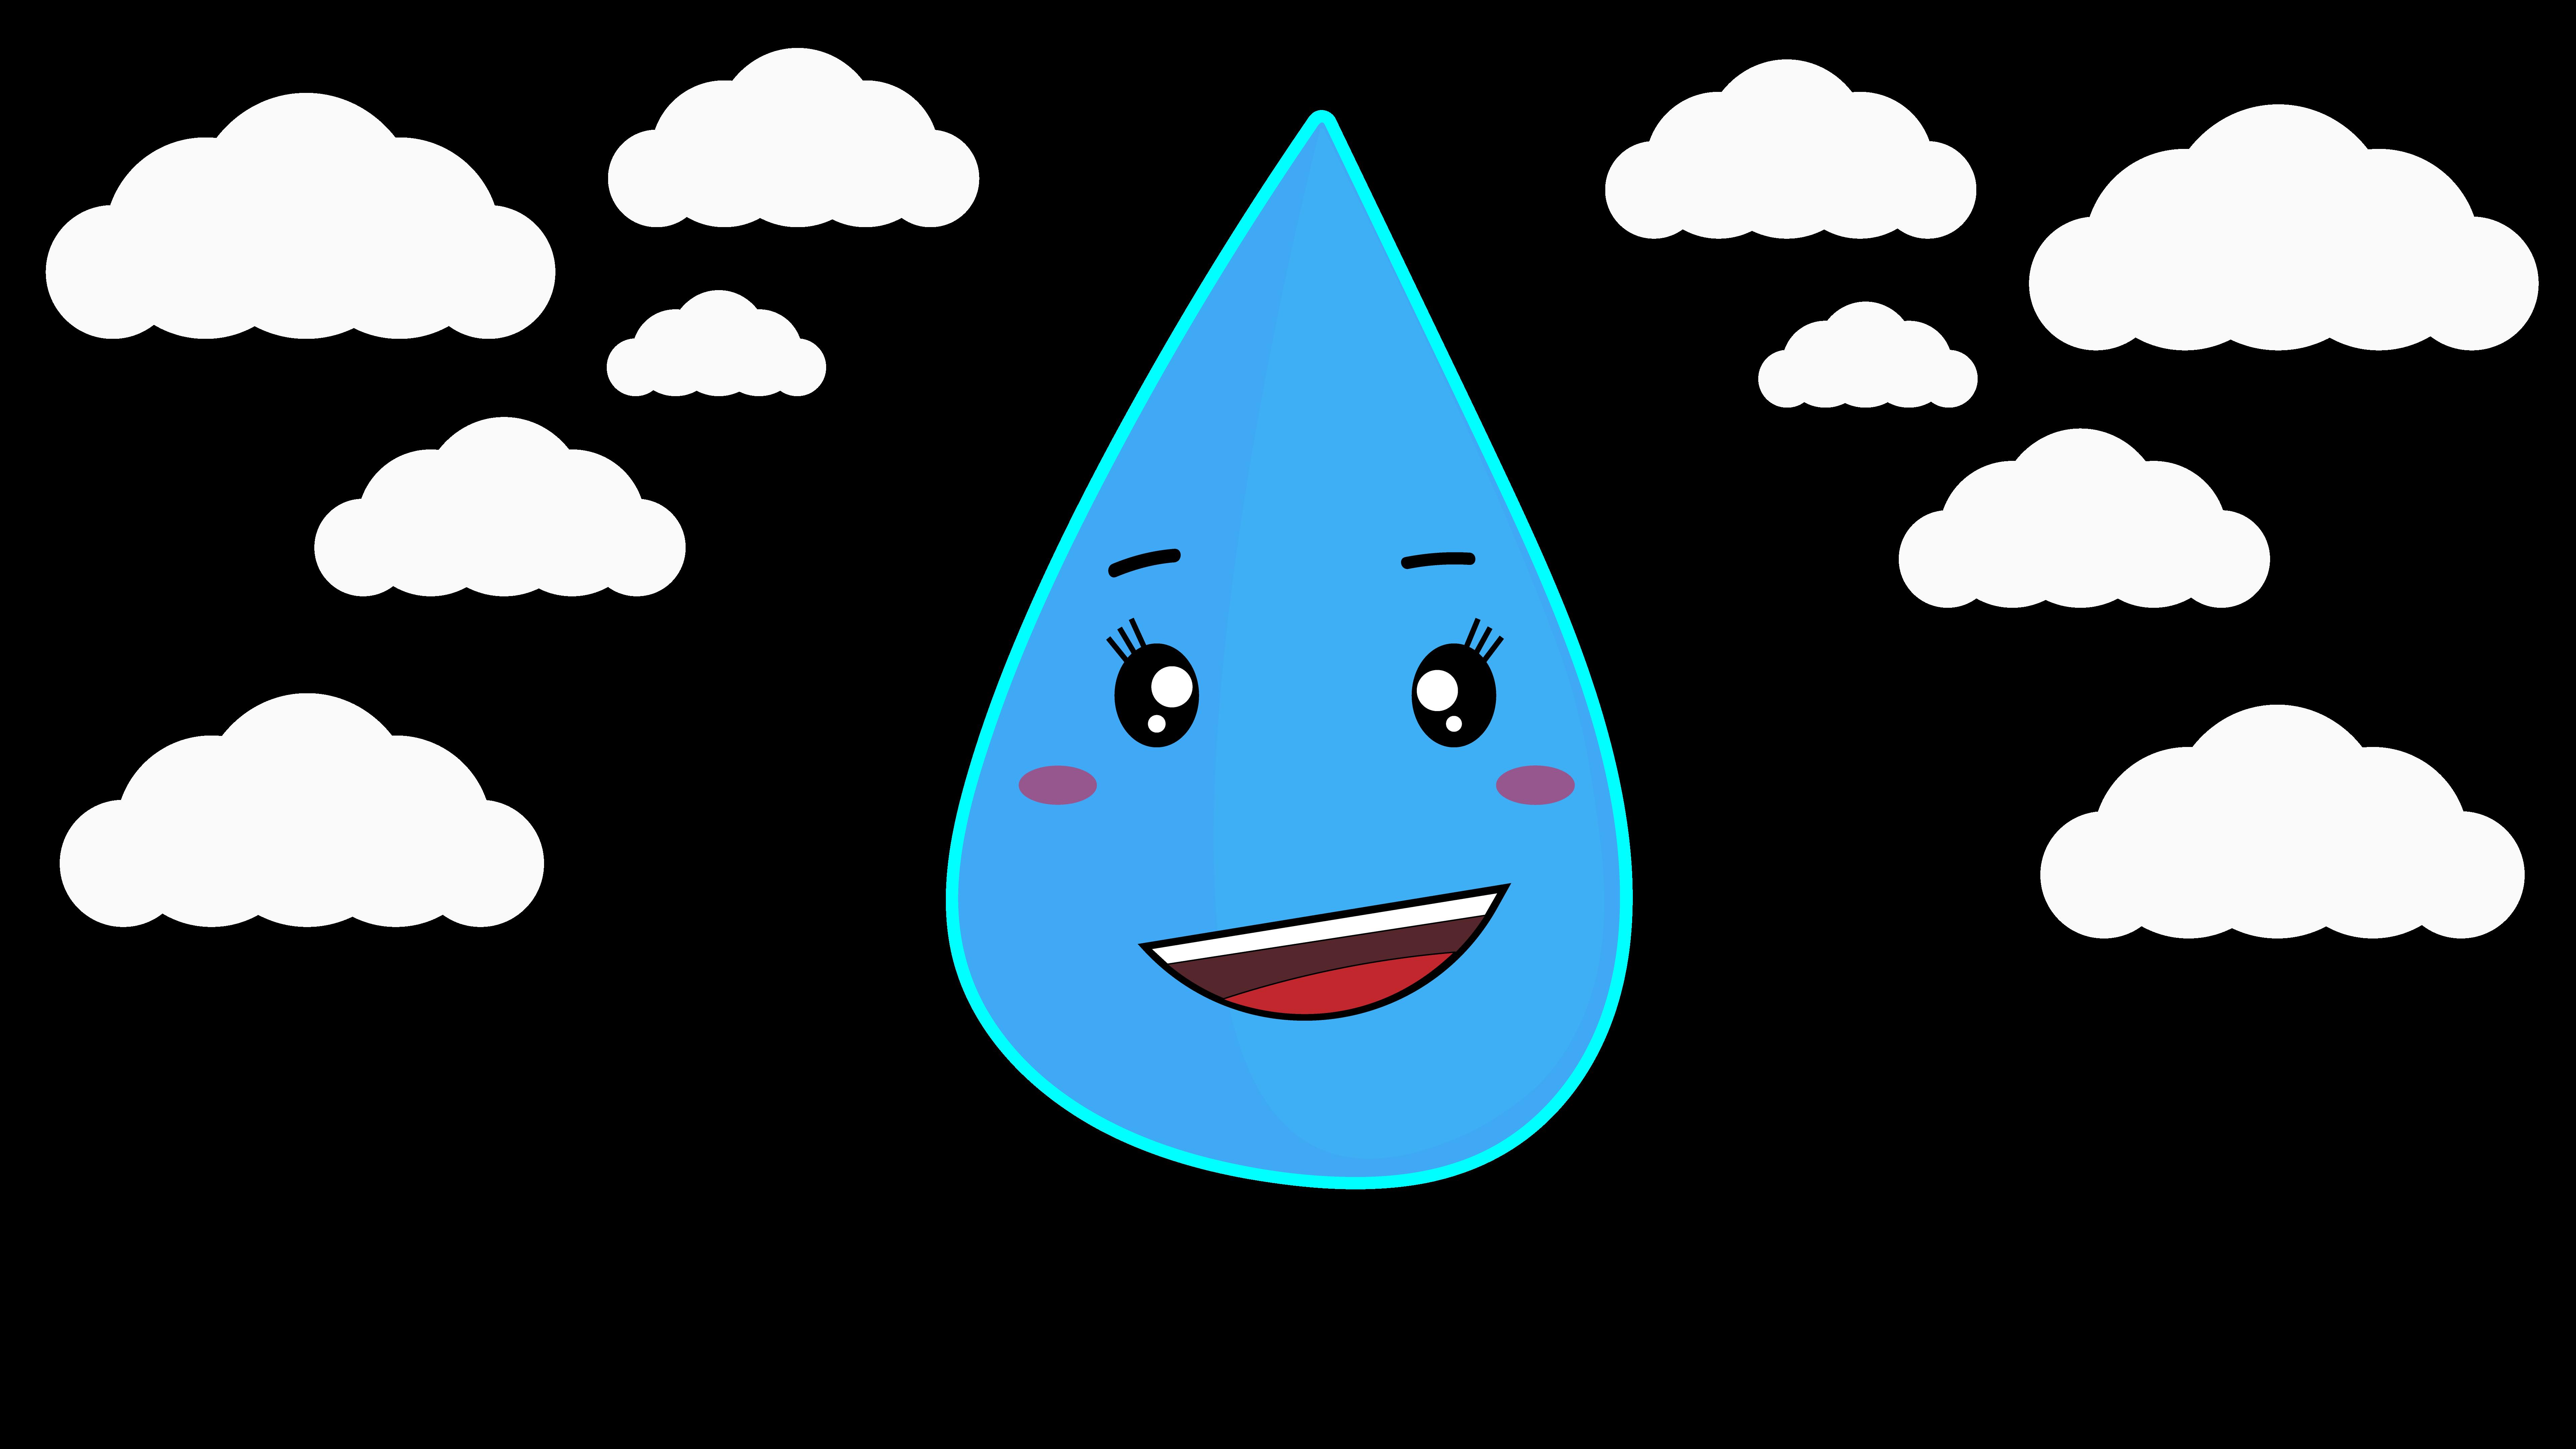 Kawaii Raindrop If You Want The Vector Just Click On It Raindrop Drawing Cute Cartoon Kawaii